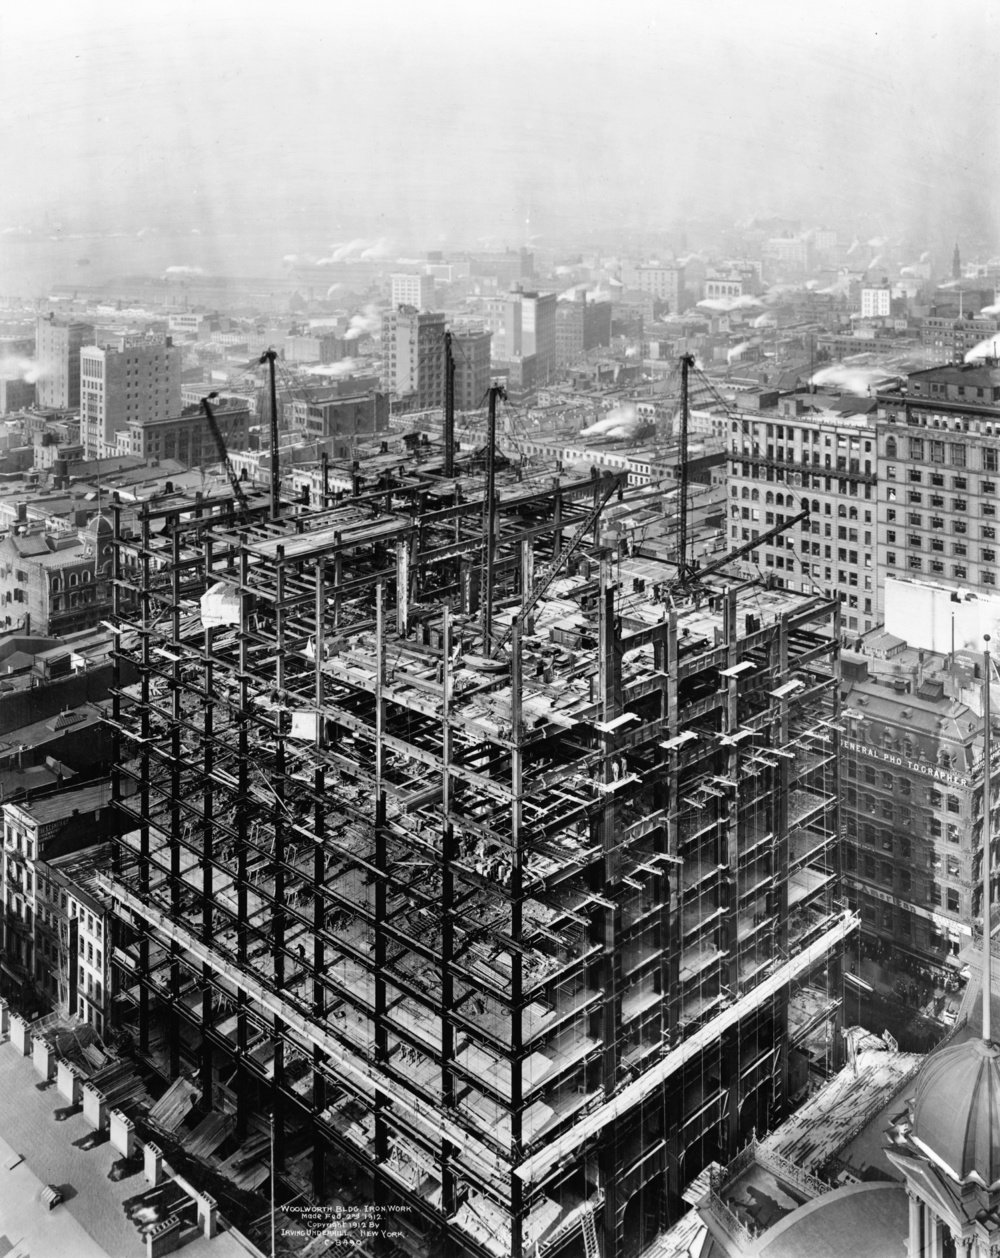 Woolworth_Building_2_Feb._1912_LC-USZ62-105567.jpg